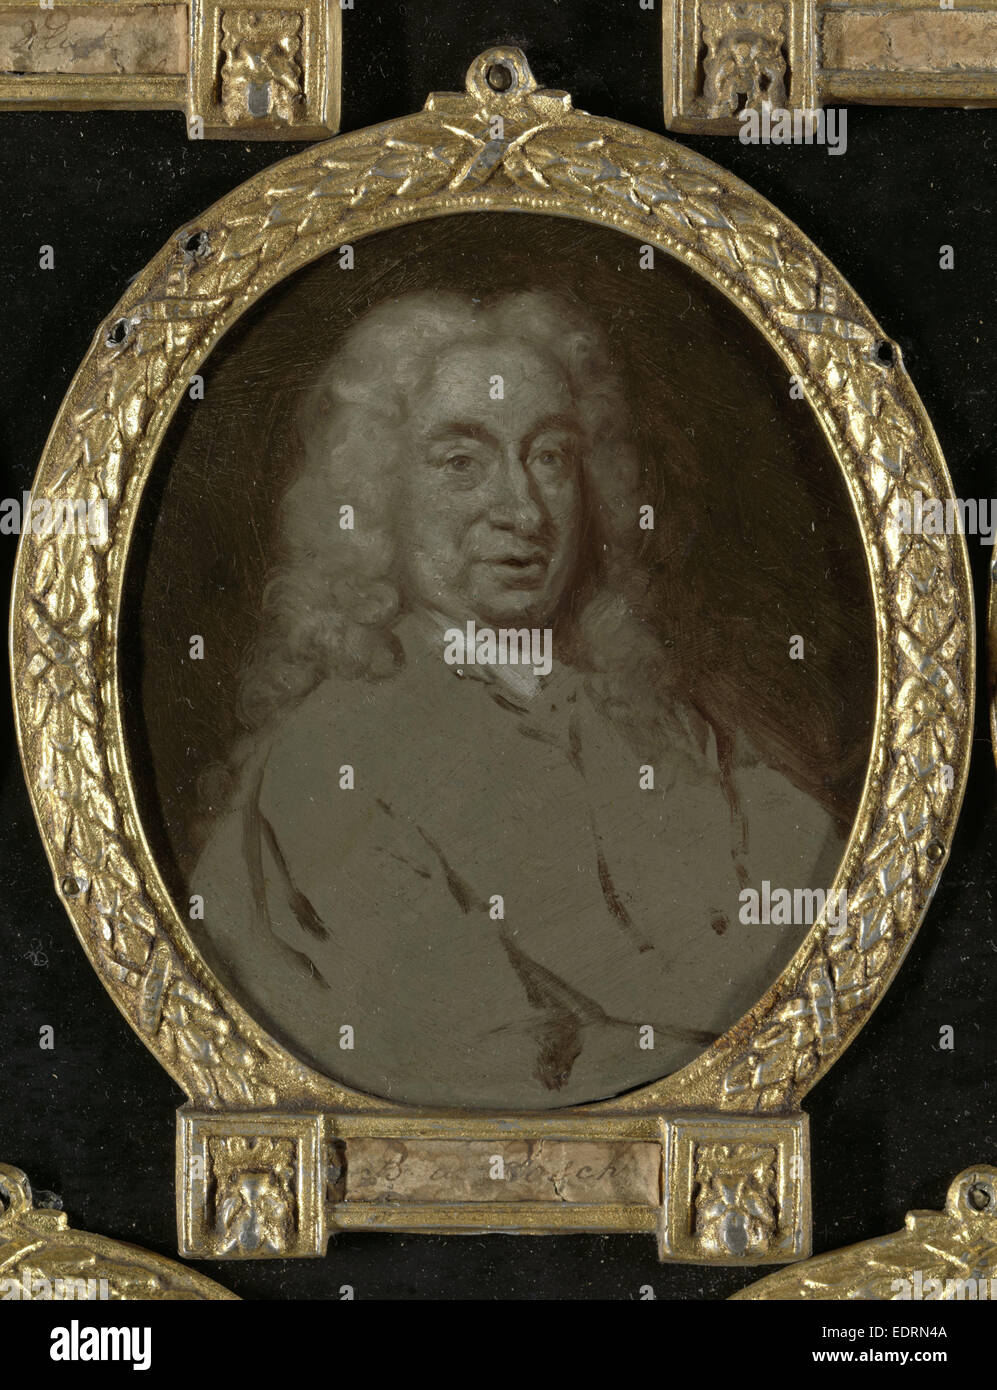 Portrait of Hendrik van der Zande, Jurist and Dramatic Poet in Amsterdam, Jan Maurits Quinkhard, 1732 - 1771 - Stock Image